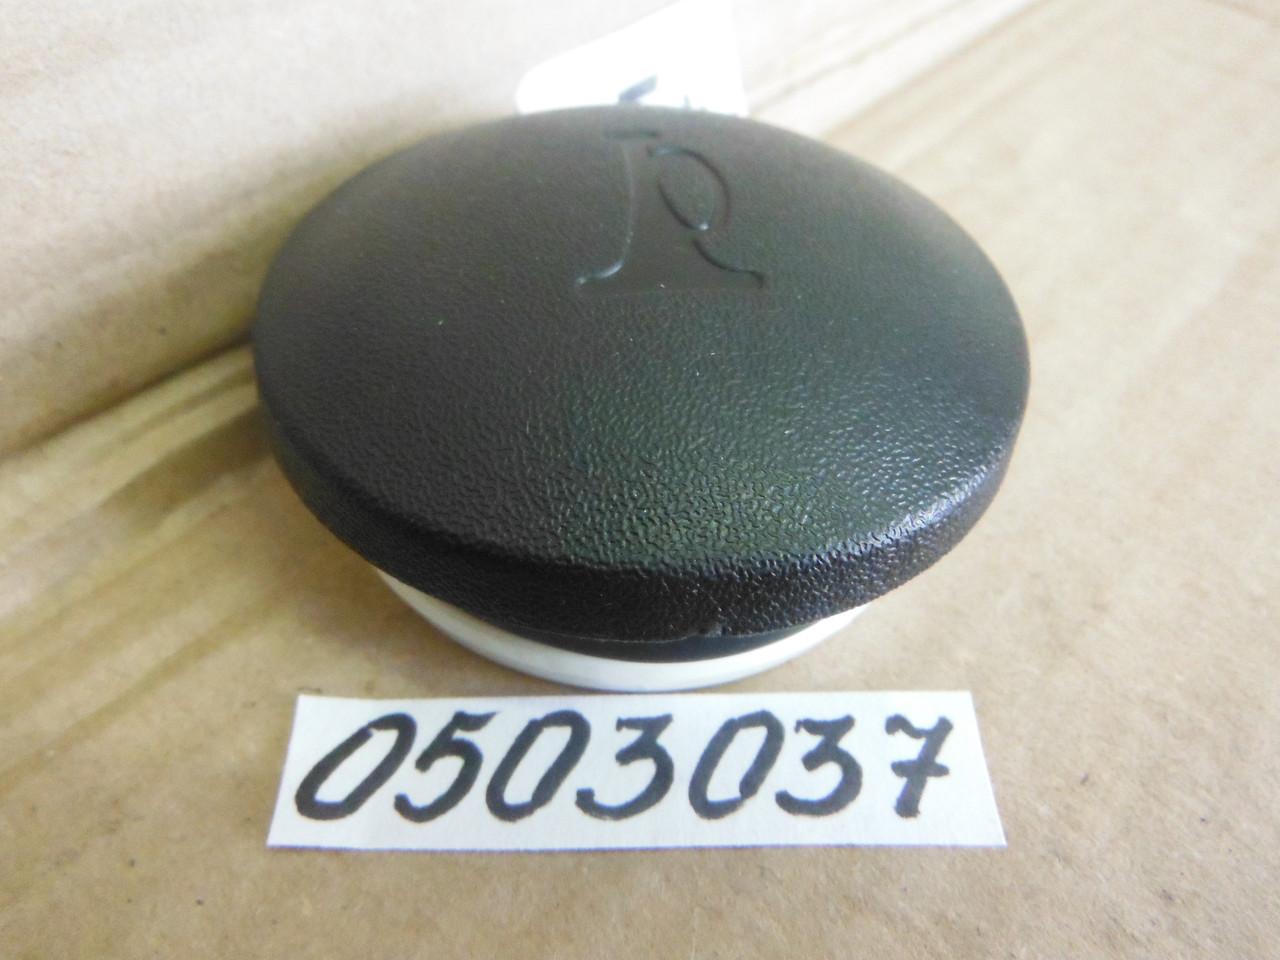 STILL 0503037 кнопка сигнала